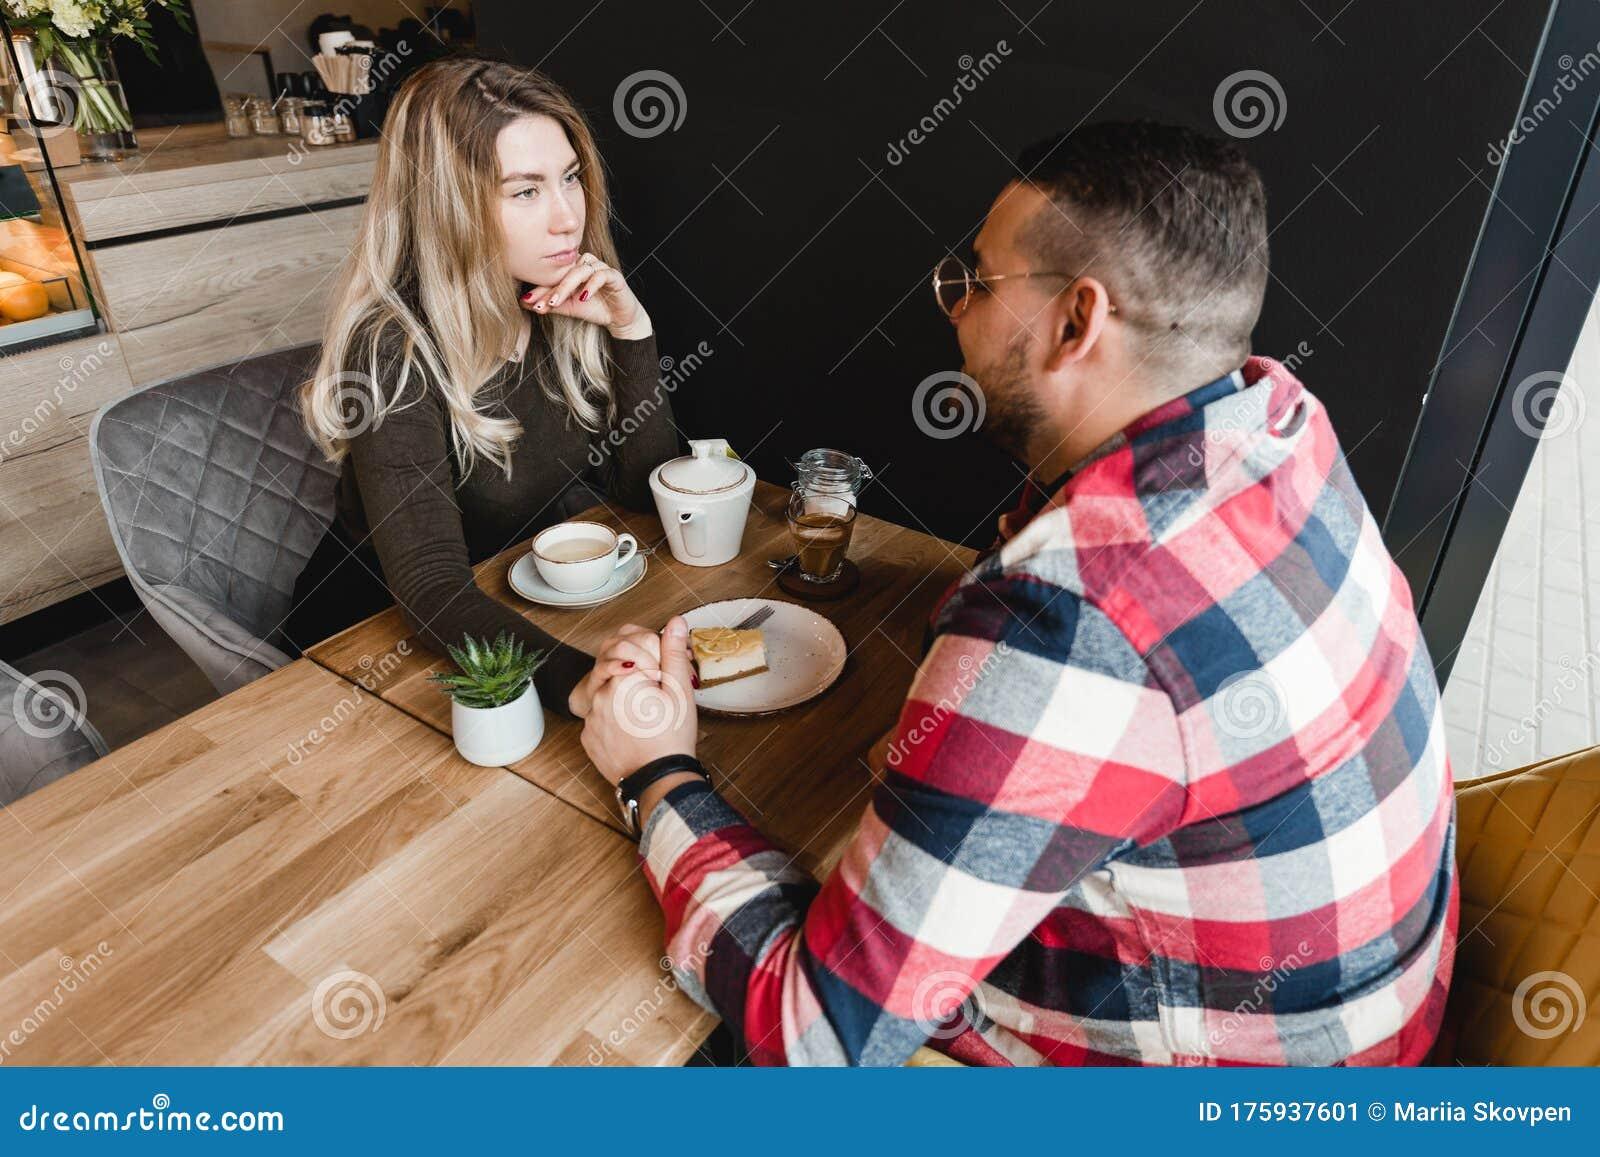 Login dating café linksoflondongift.com